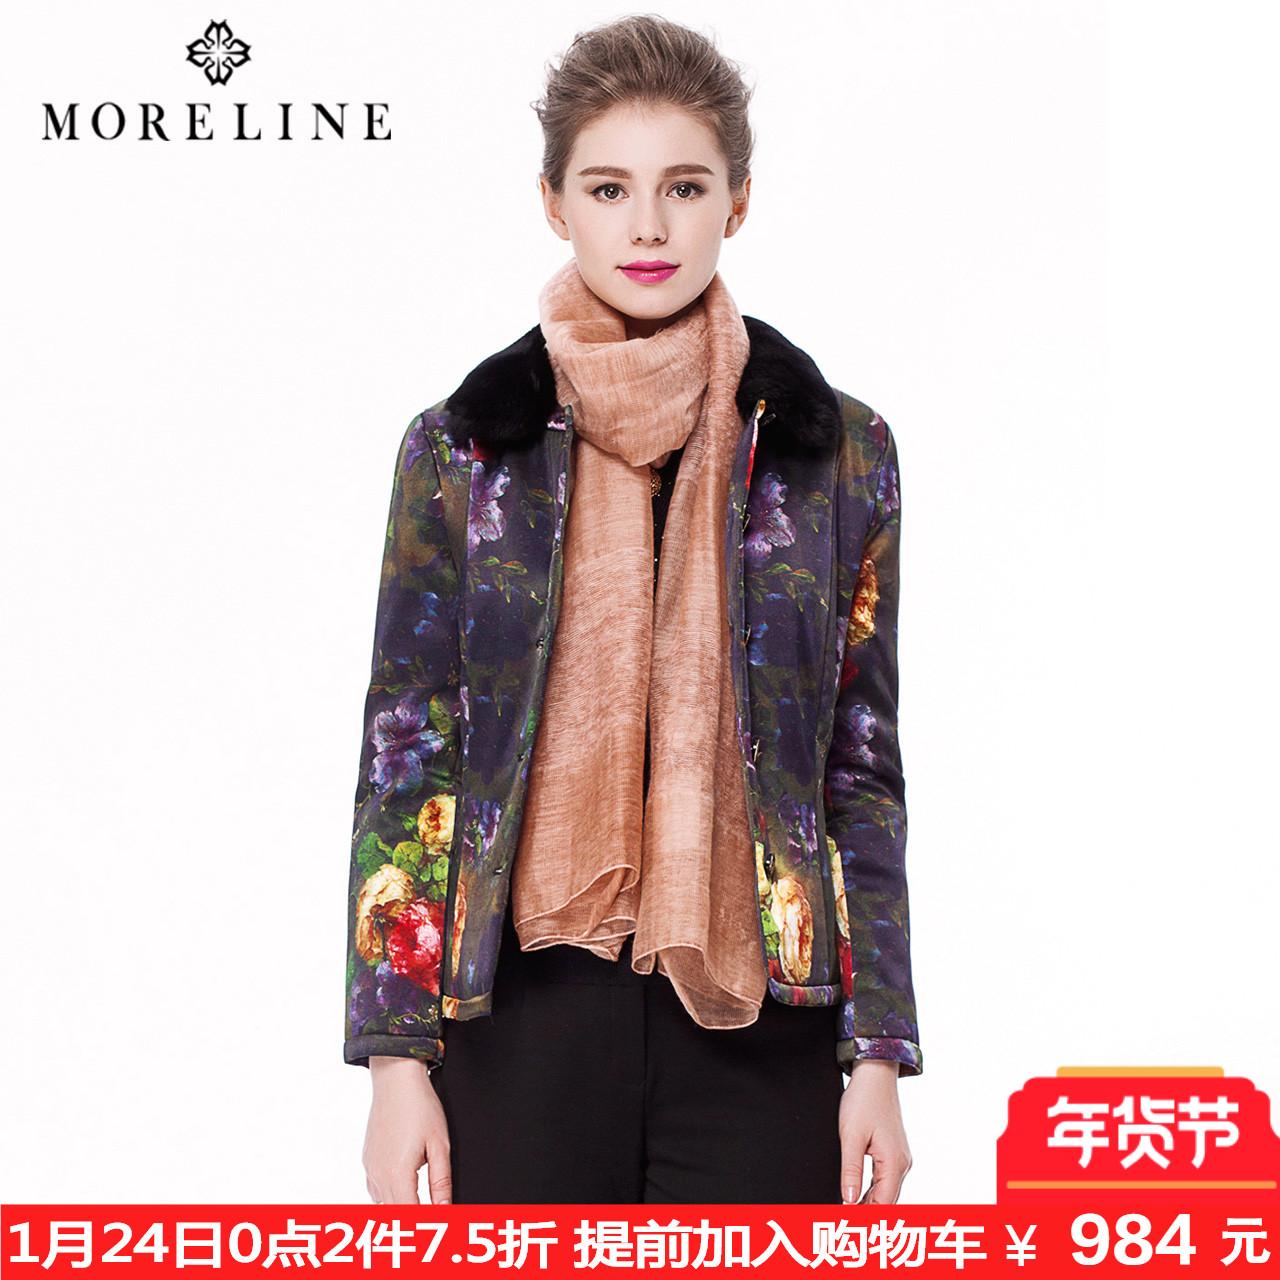 MORELINE秋冬精品 轻盈保暖修身短款獭兔毛领真丝印花棉服5881251